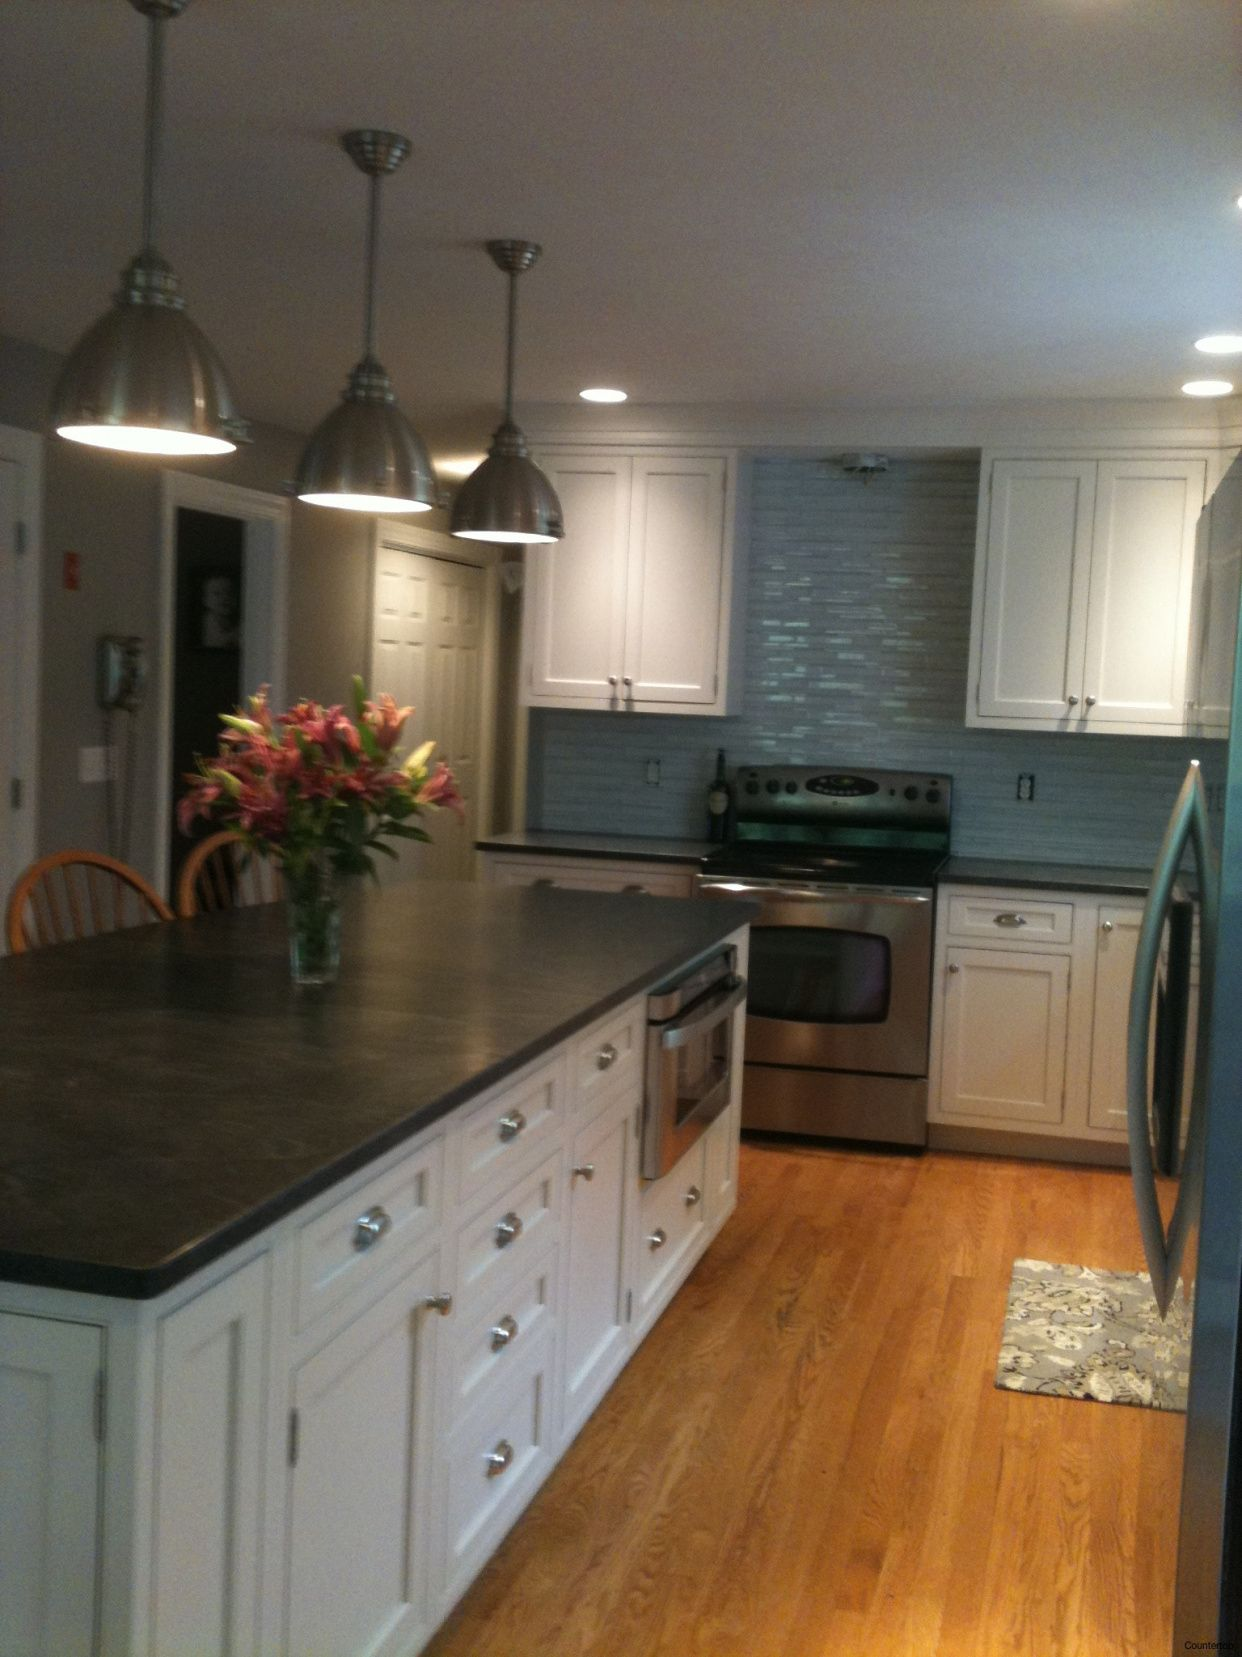 55 Prefab Granite Countertops Reno Nv Kitchen Counter Top Ideas Check More At Http Ma Modern Grey Kitchen Kitchen Cabinet Design Black Granite Countertops